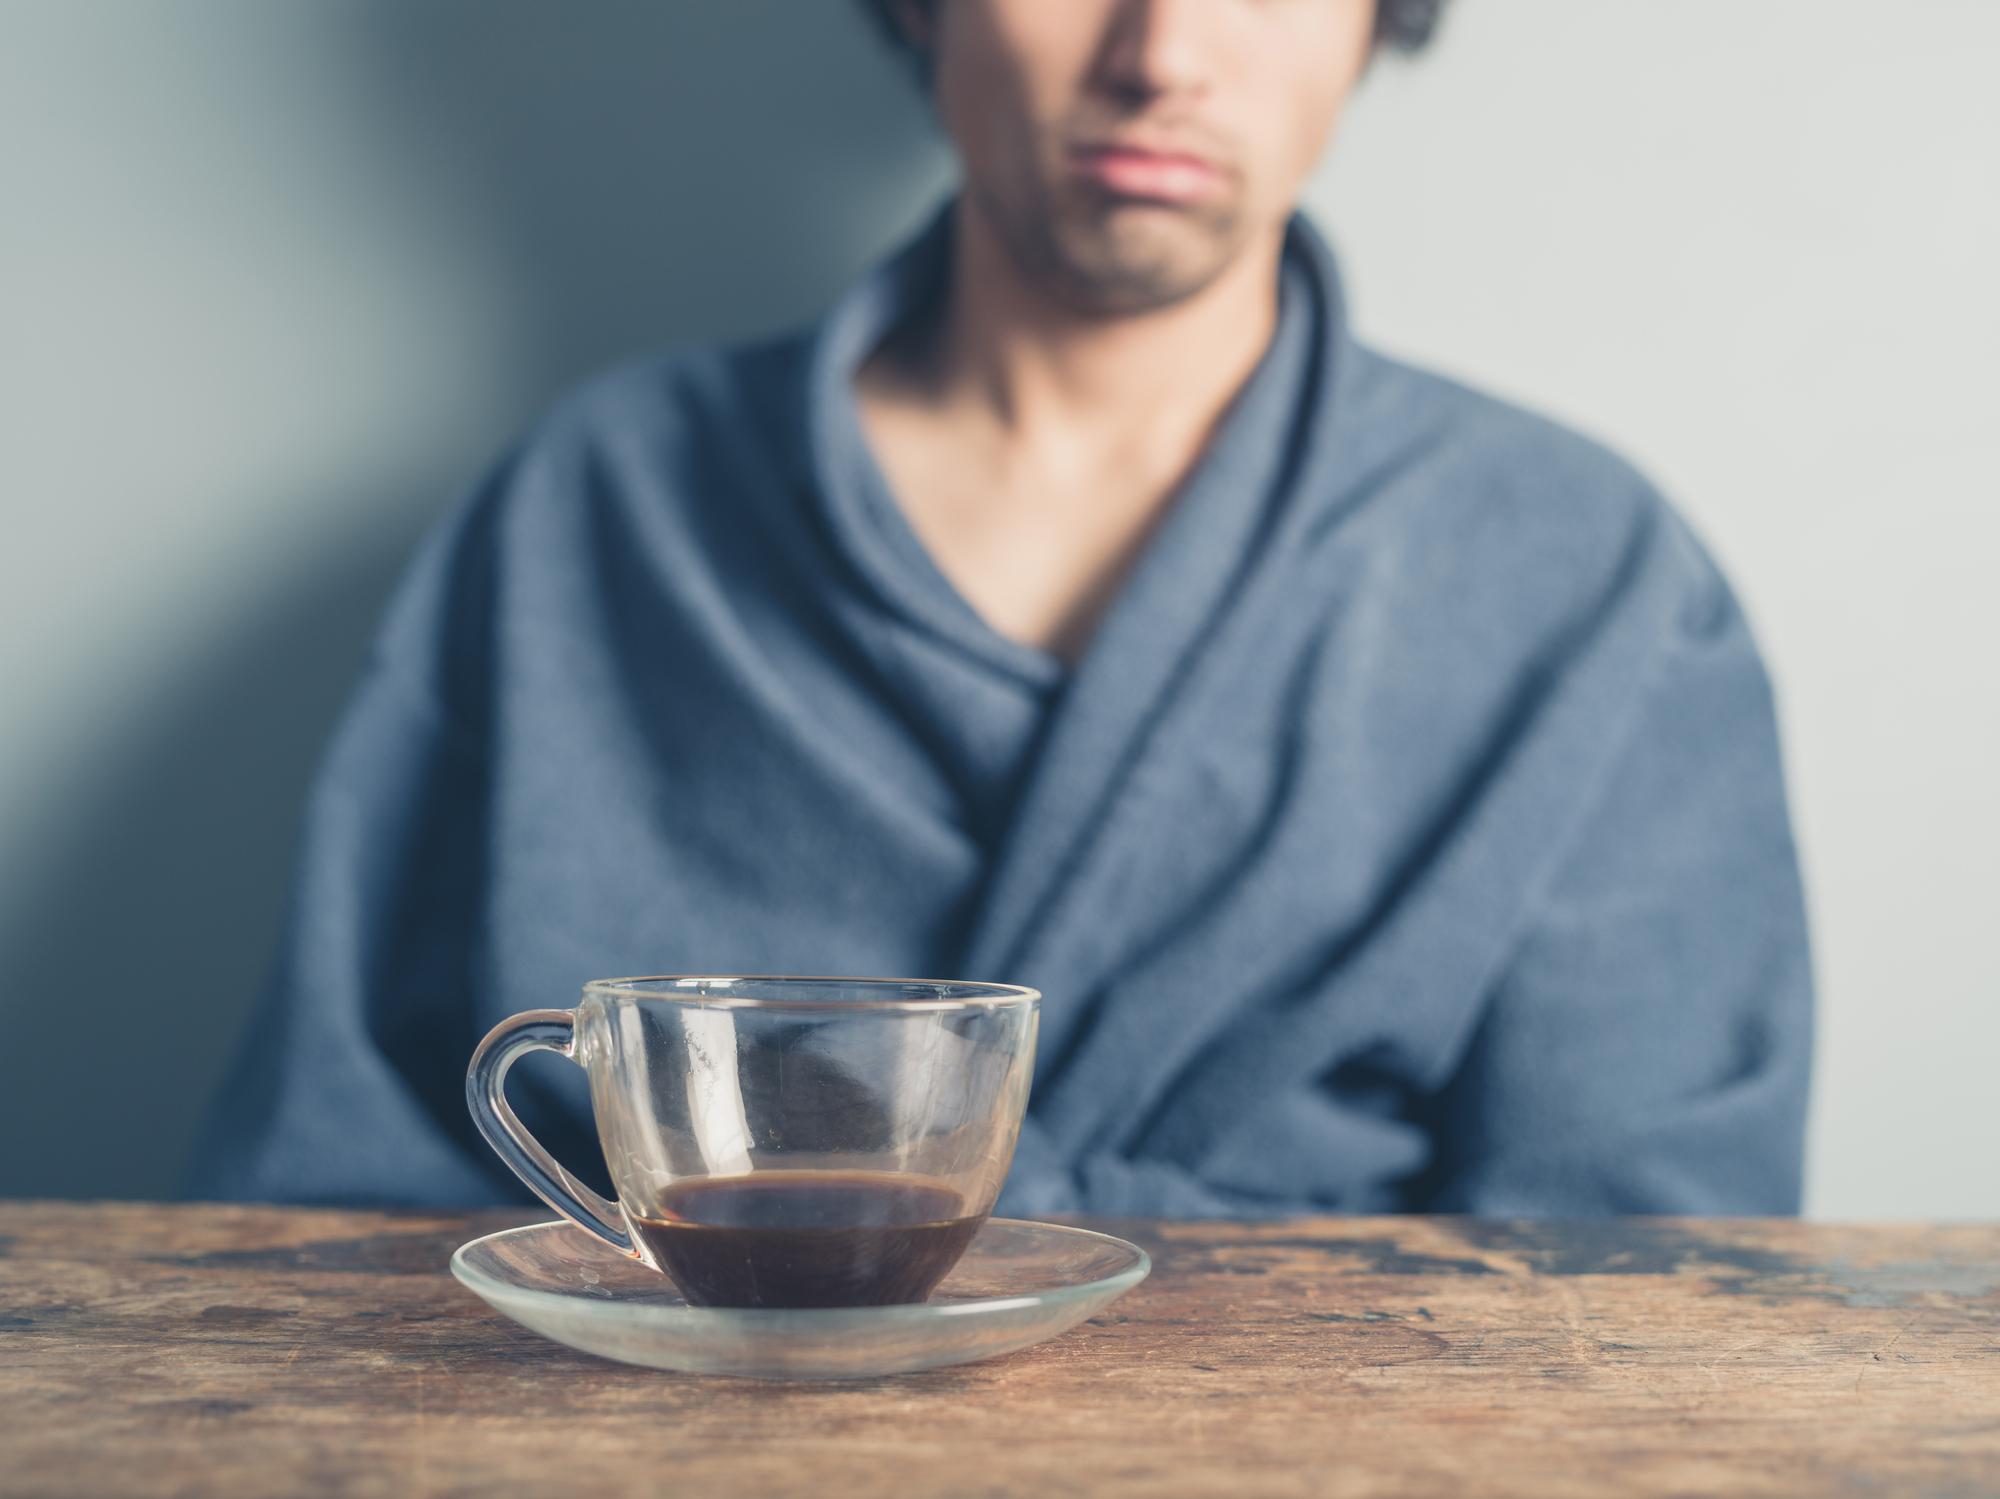 Study Suggests Link Between Sleep Deprivation, Alzheimers Risk